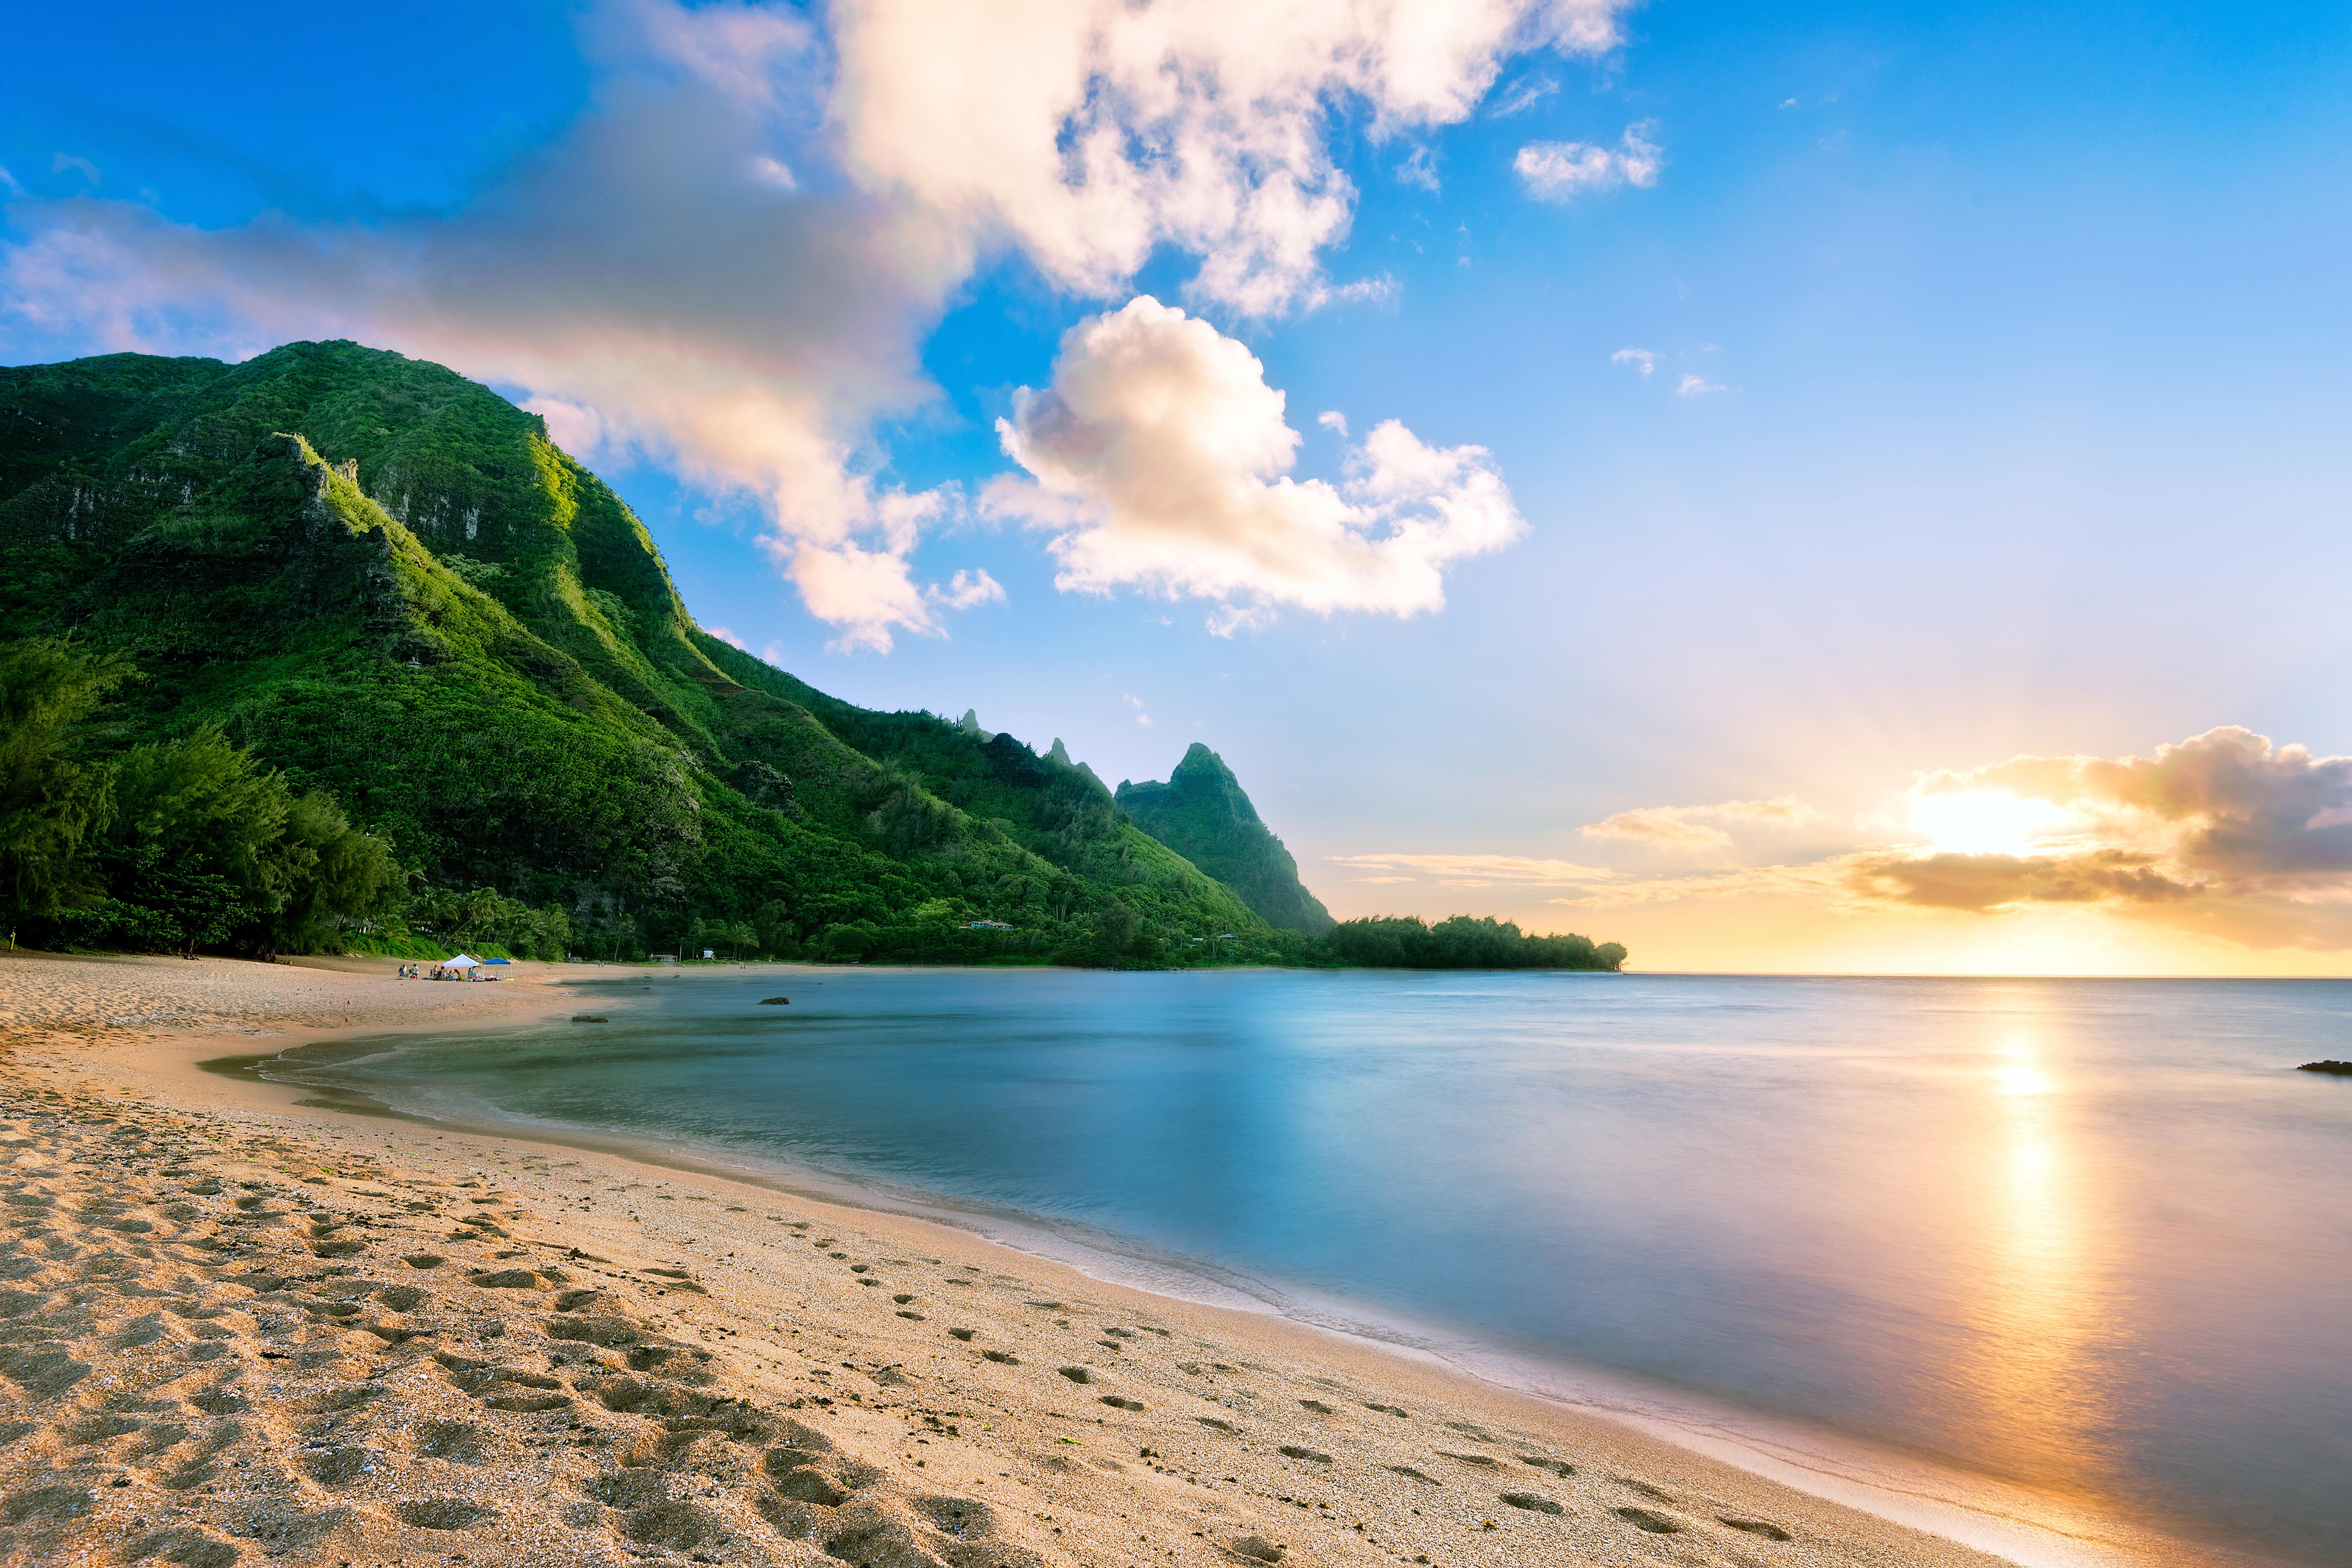 Best Kauai Snorkeling Spots, Tunnels Beach, Kauai Vacation